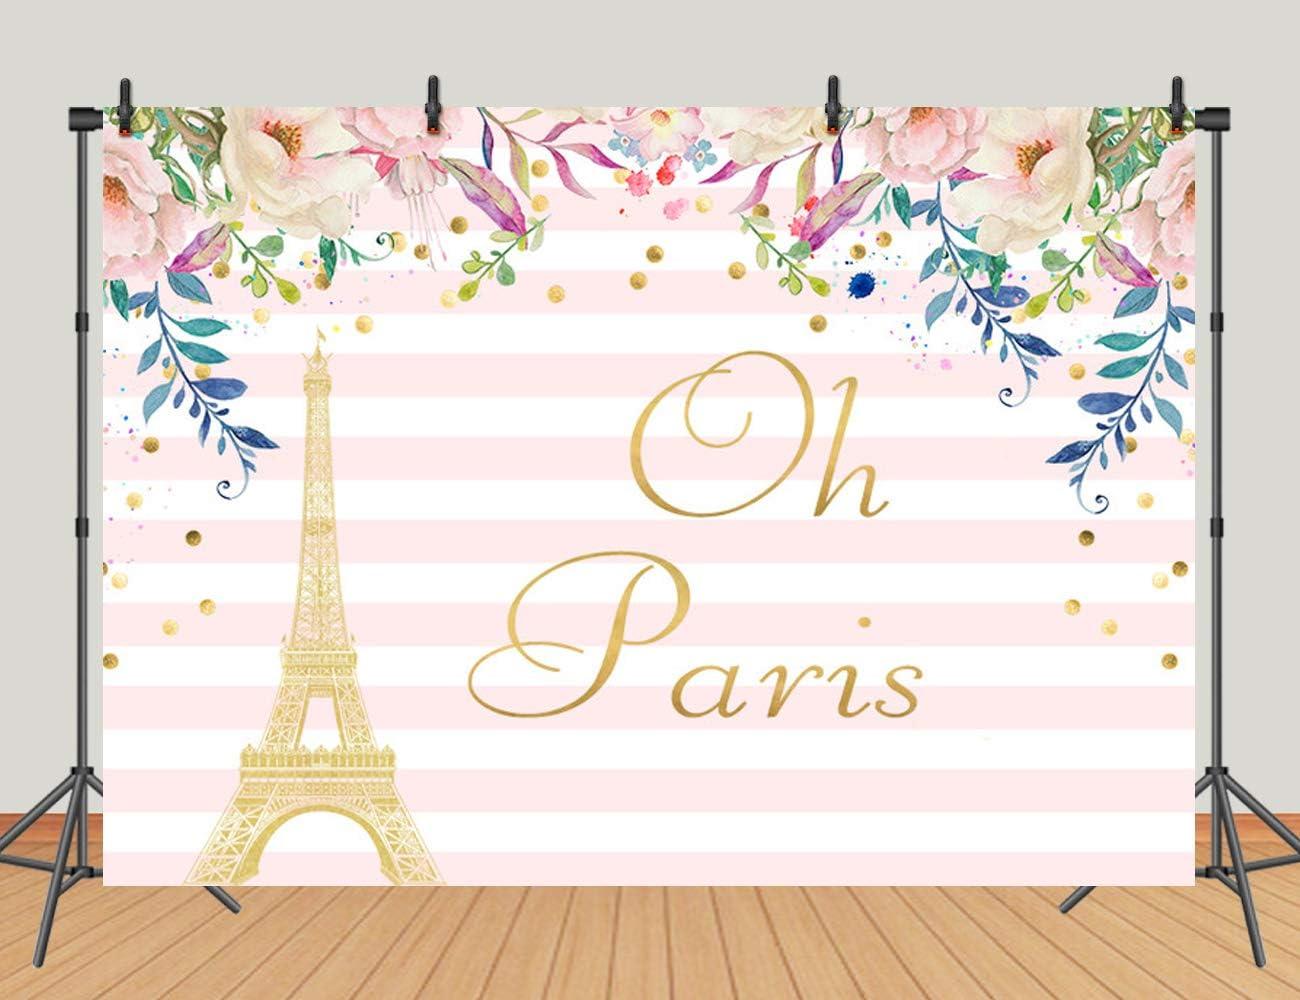 Sensfun 8x6ft Paris Eiffel Tower Photography Backdrop Striped Flowers Birthday Party Decorations Newborn Vinyl Background